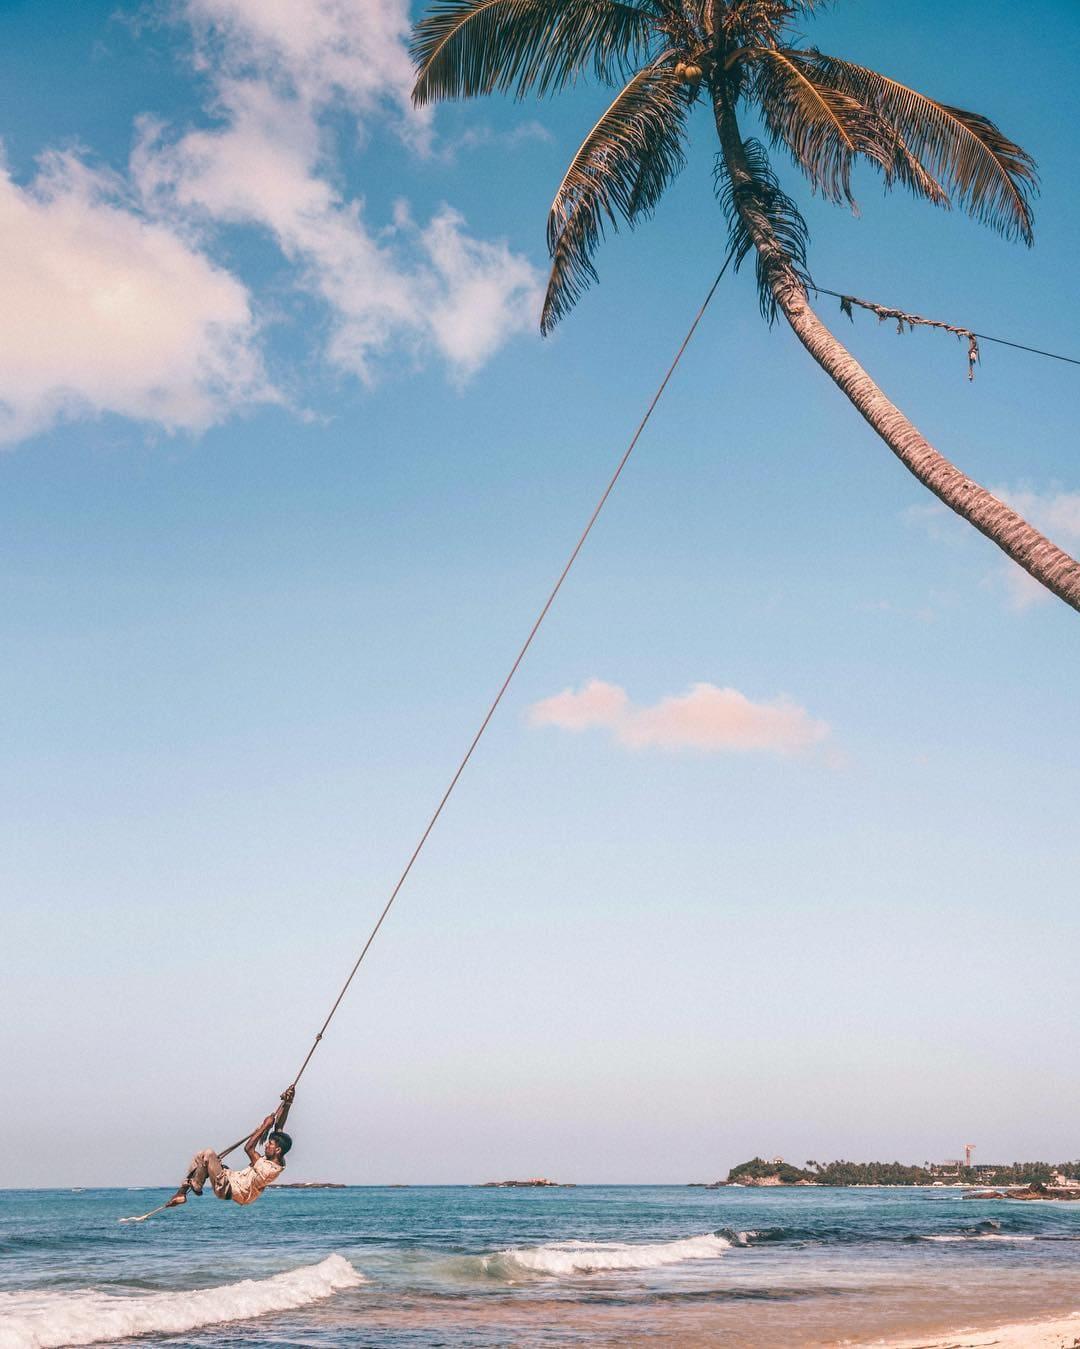 instagrammable places in Sri Lanka, palm tree in Dalawella beach